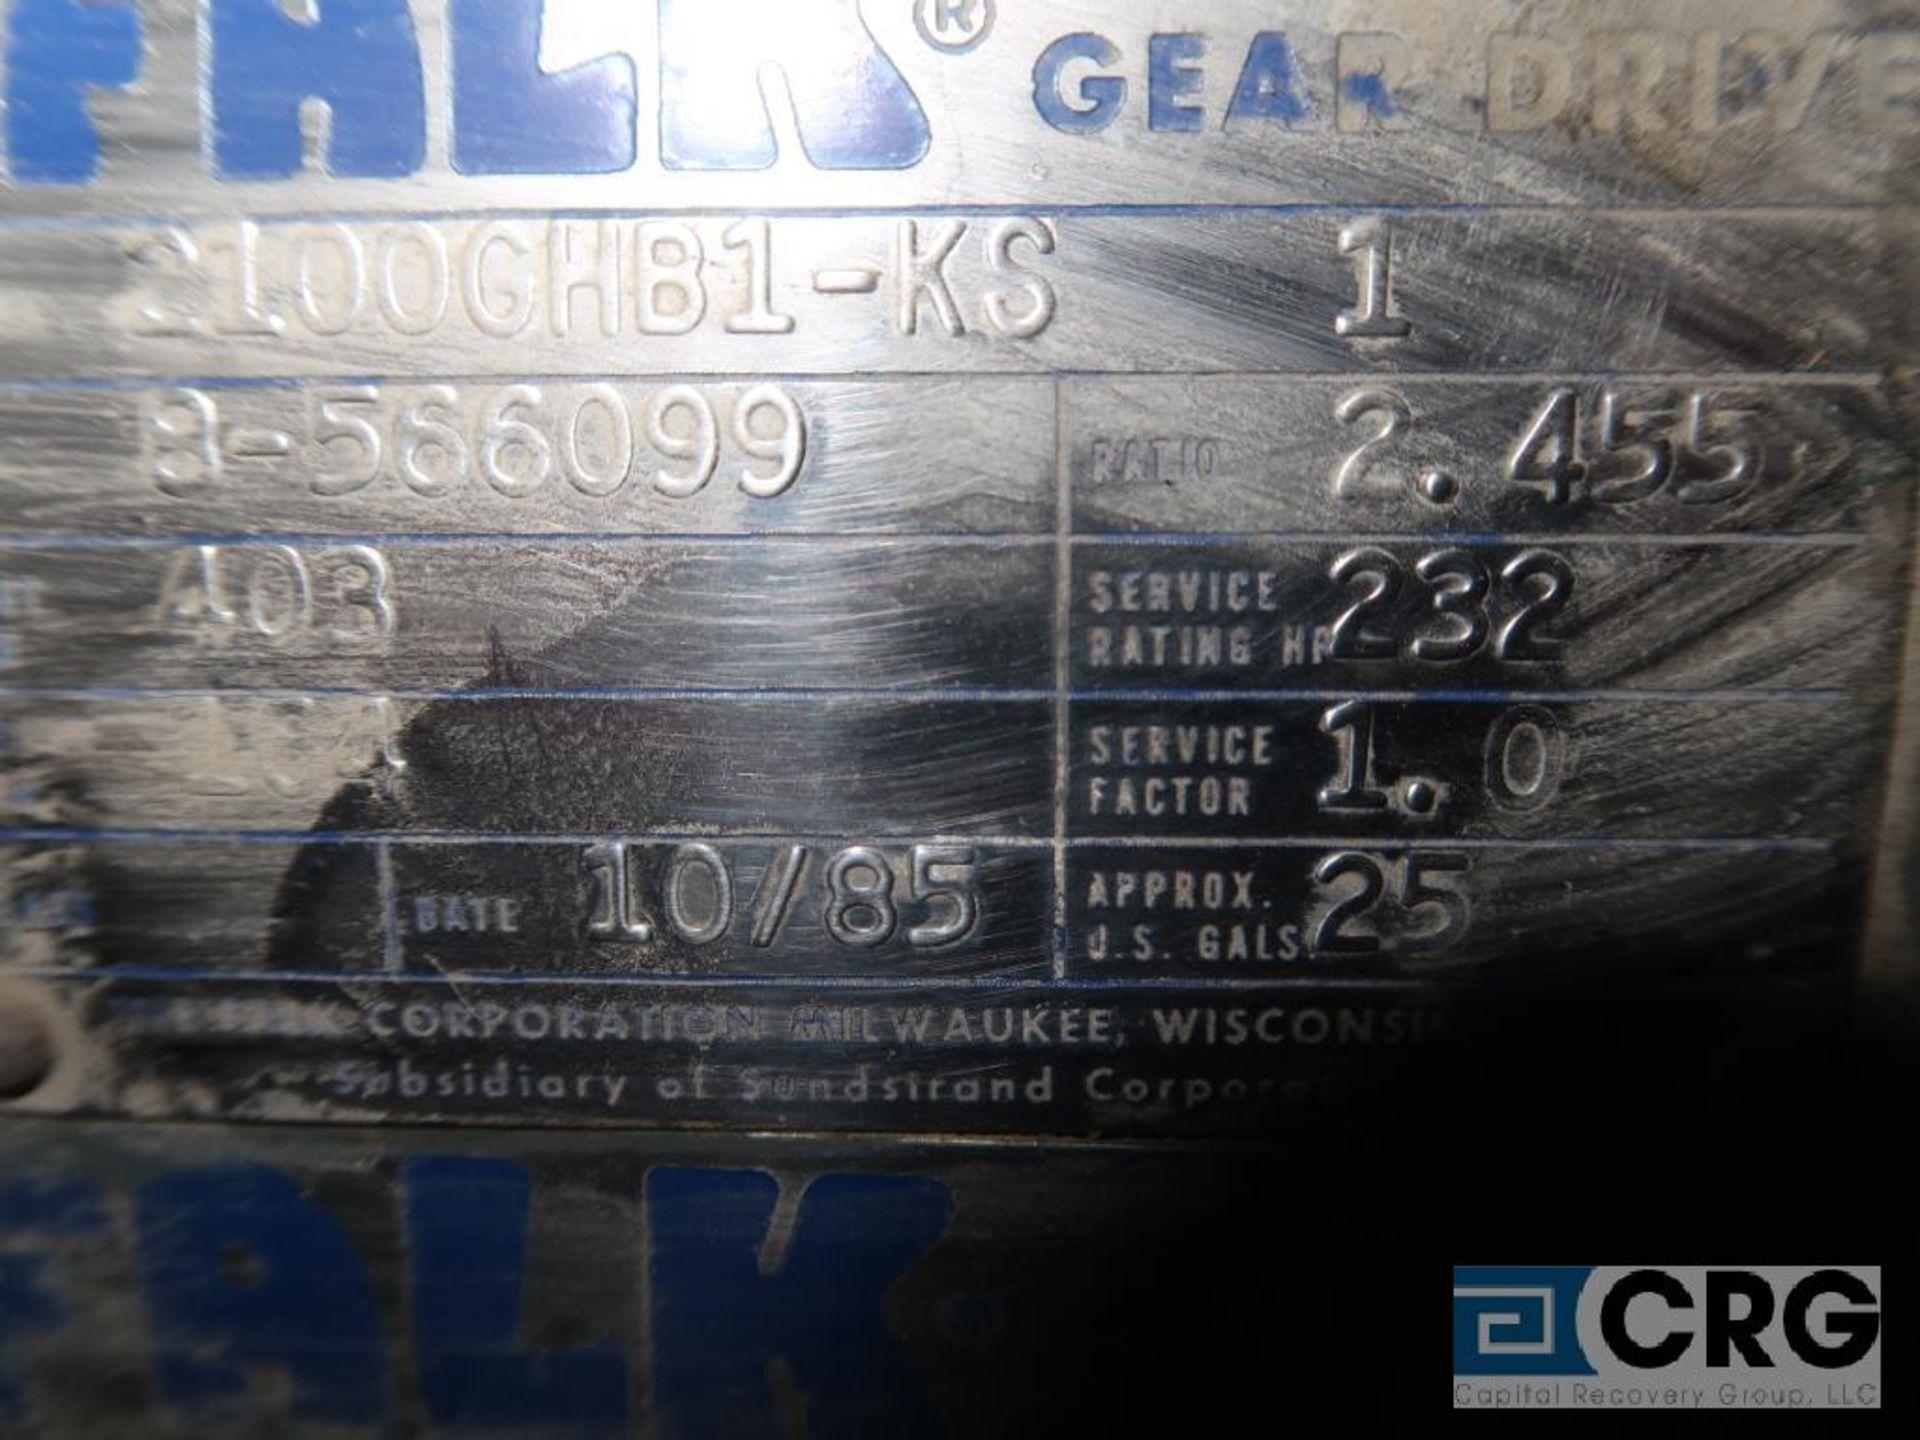 Falk 2100 GH81 KS gear drive, ratio-2.455, input RPM 403, output RPM 164, service rate HP. 232, s/ - Image 3 of 3